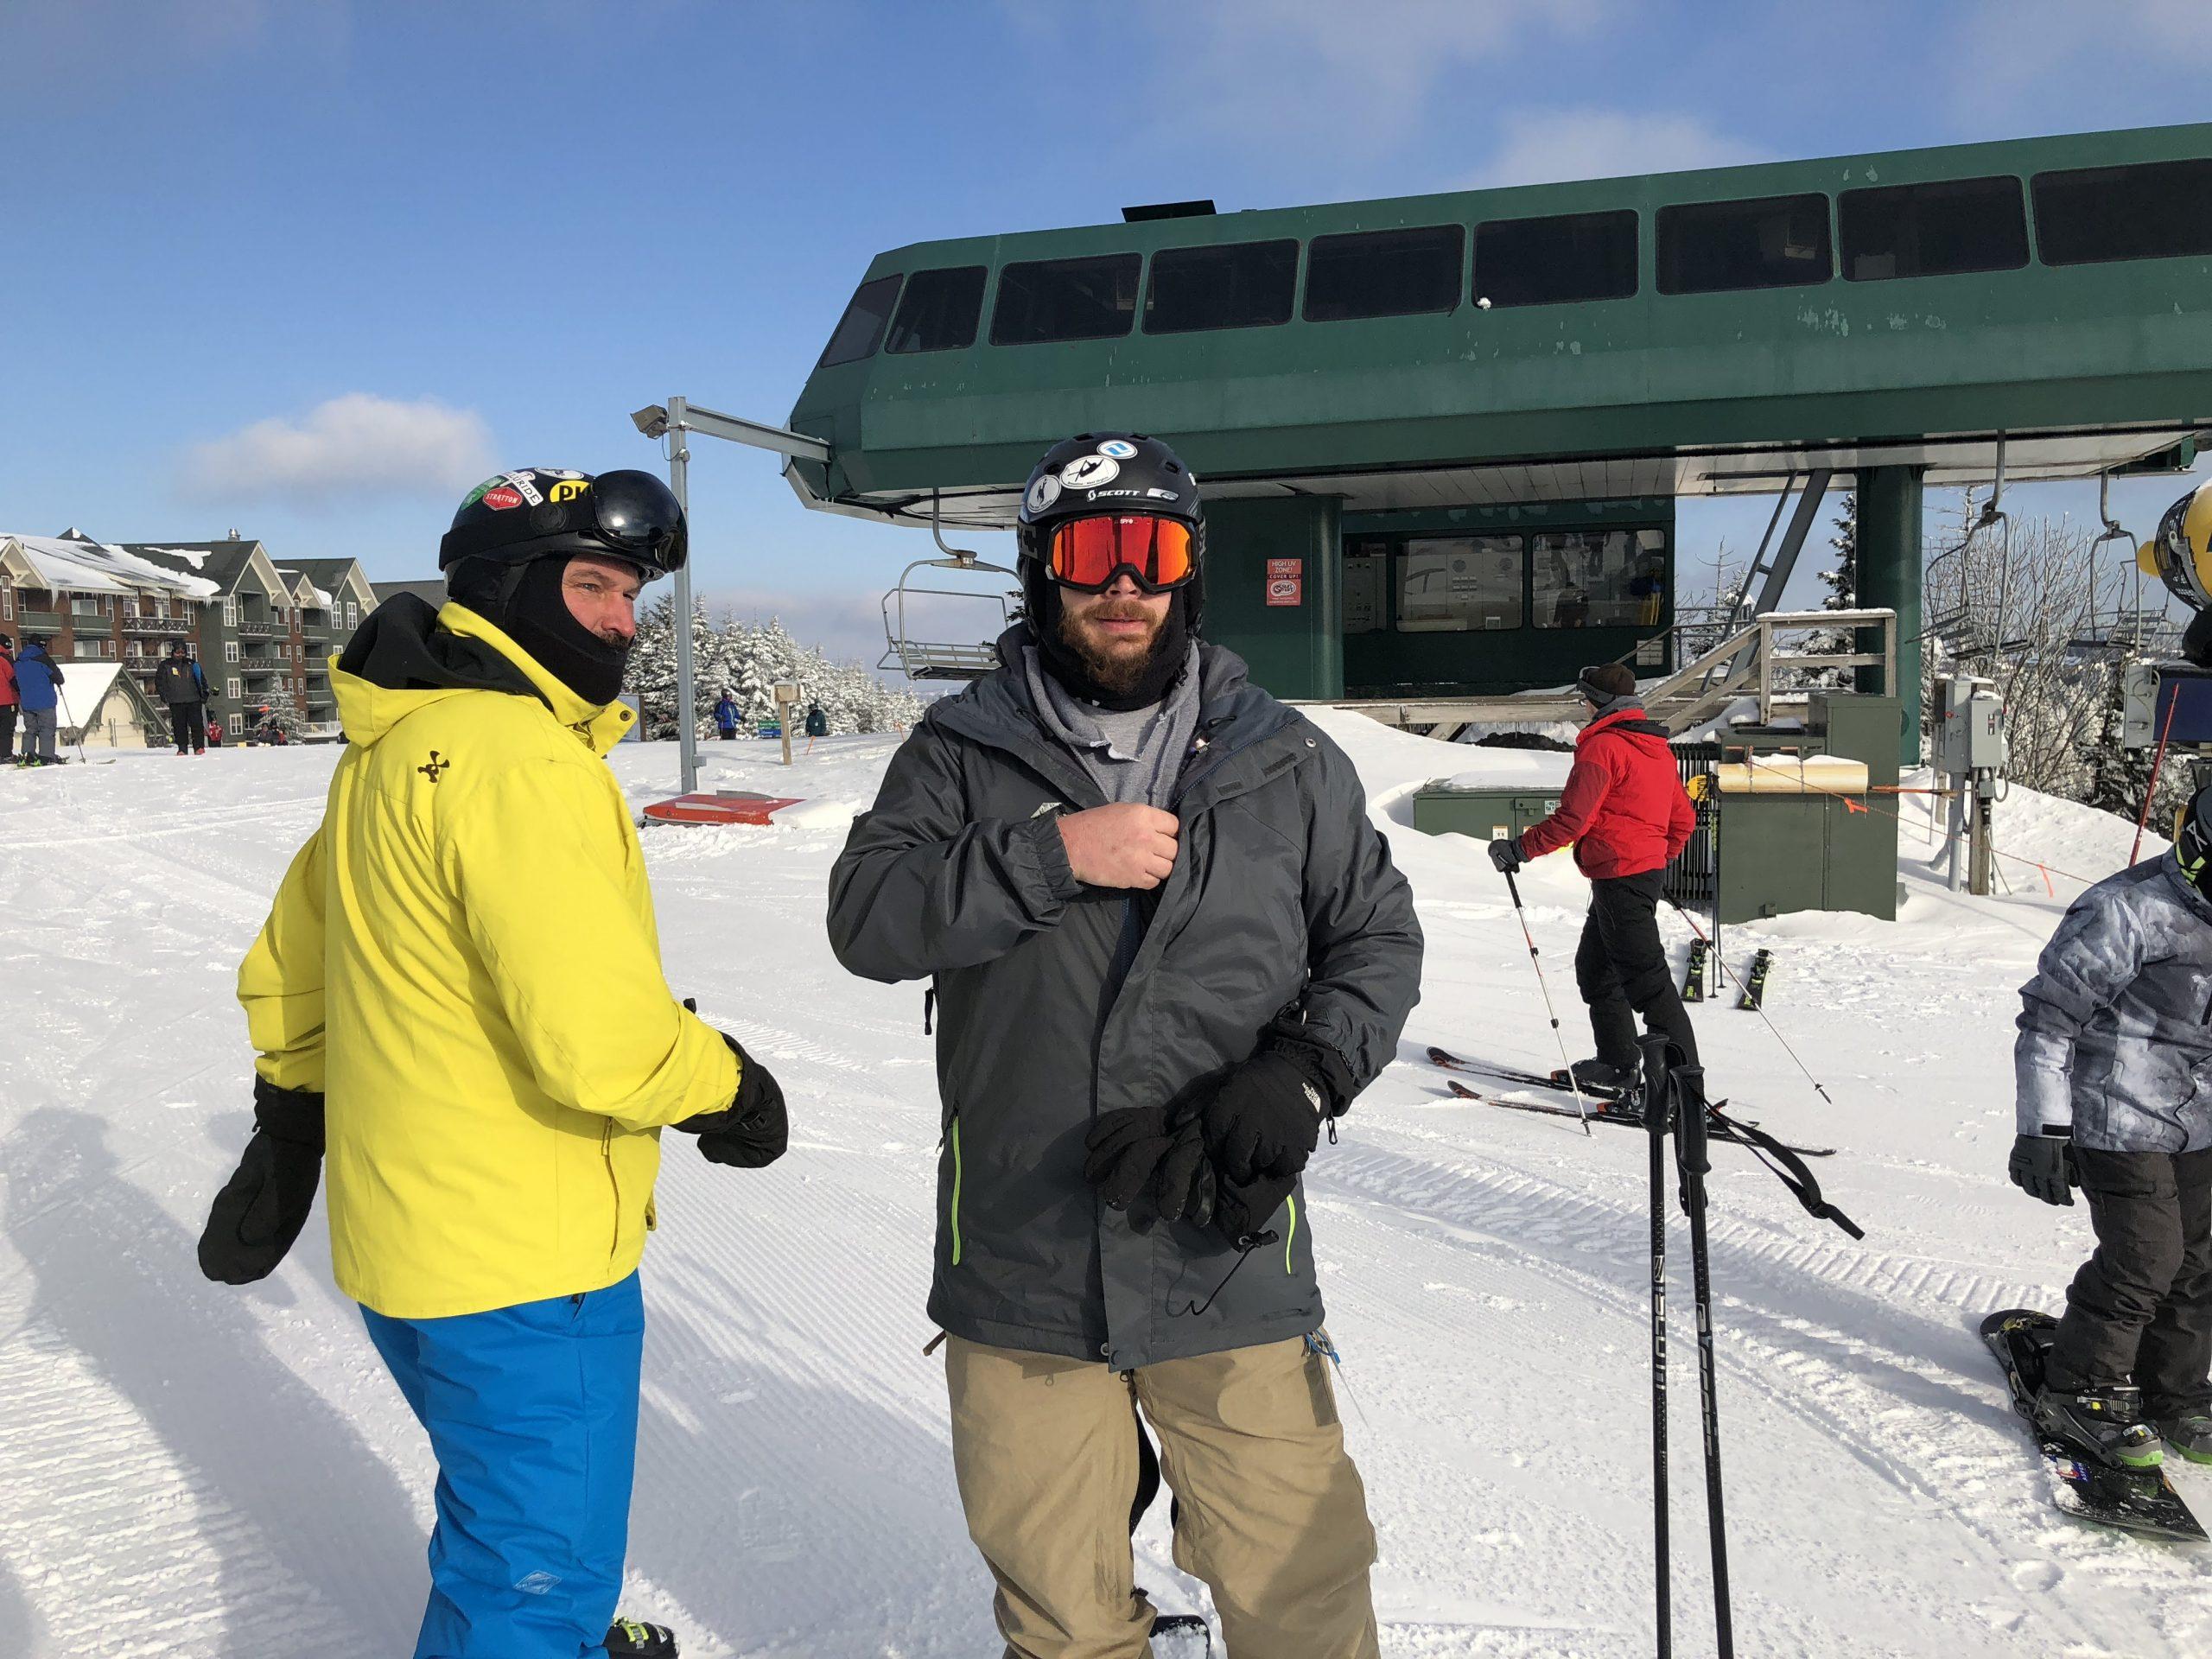 Winter-at-Snowshoe